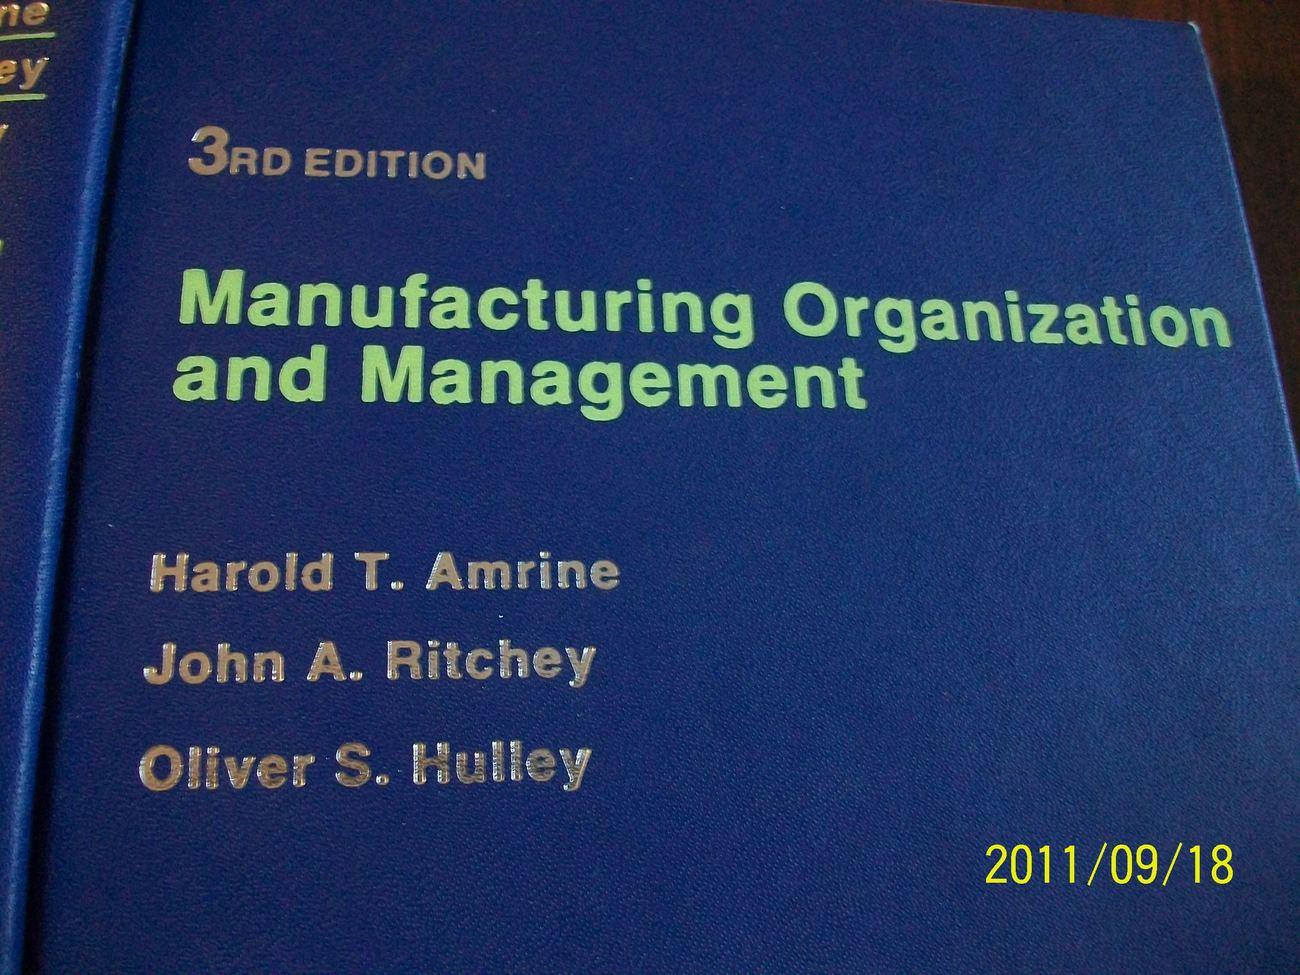 Manufacturing Organization Management Ritchey Amrine Hulley